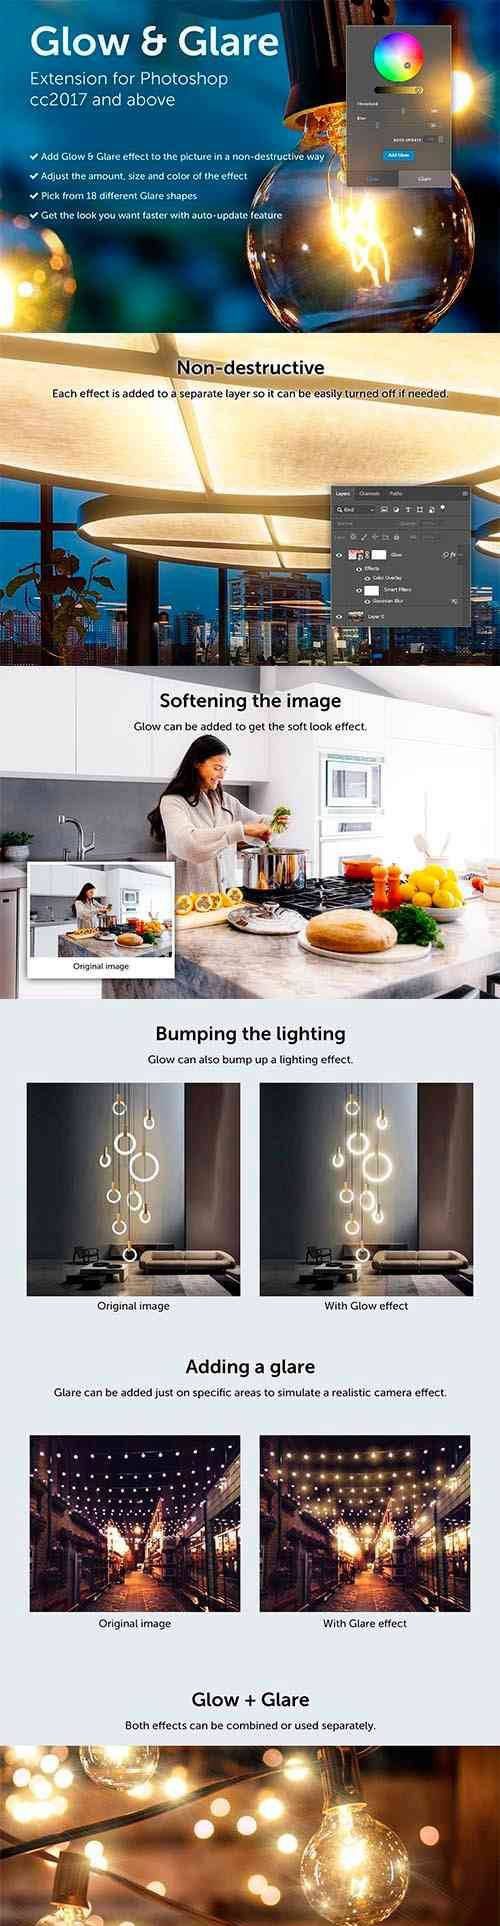 Glow & Glare - Photoshop Extension 4176868